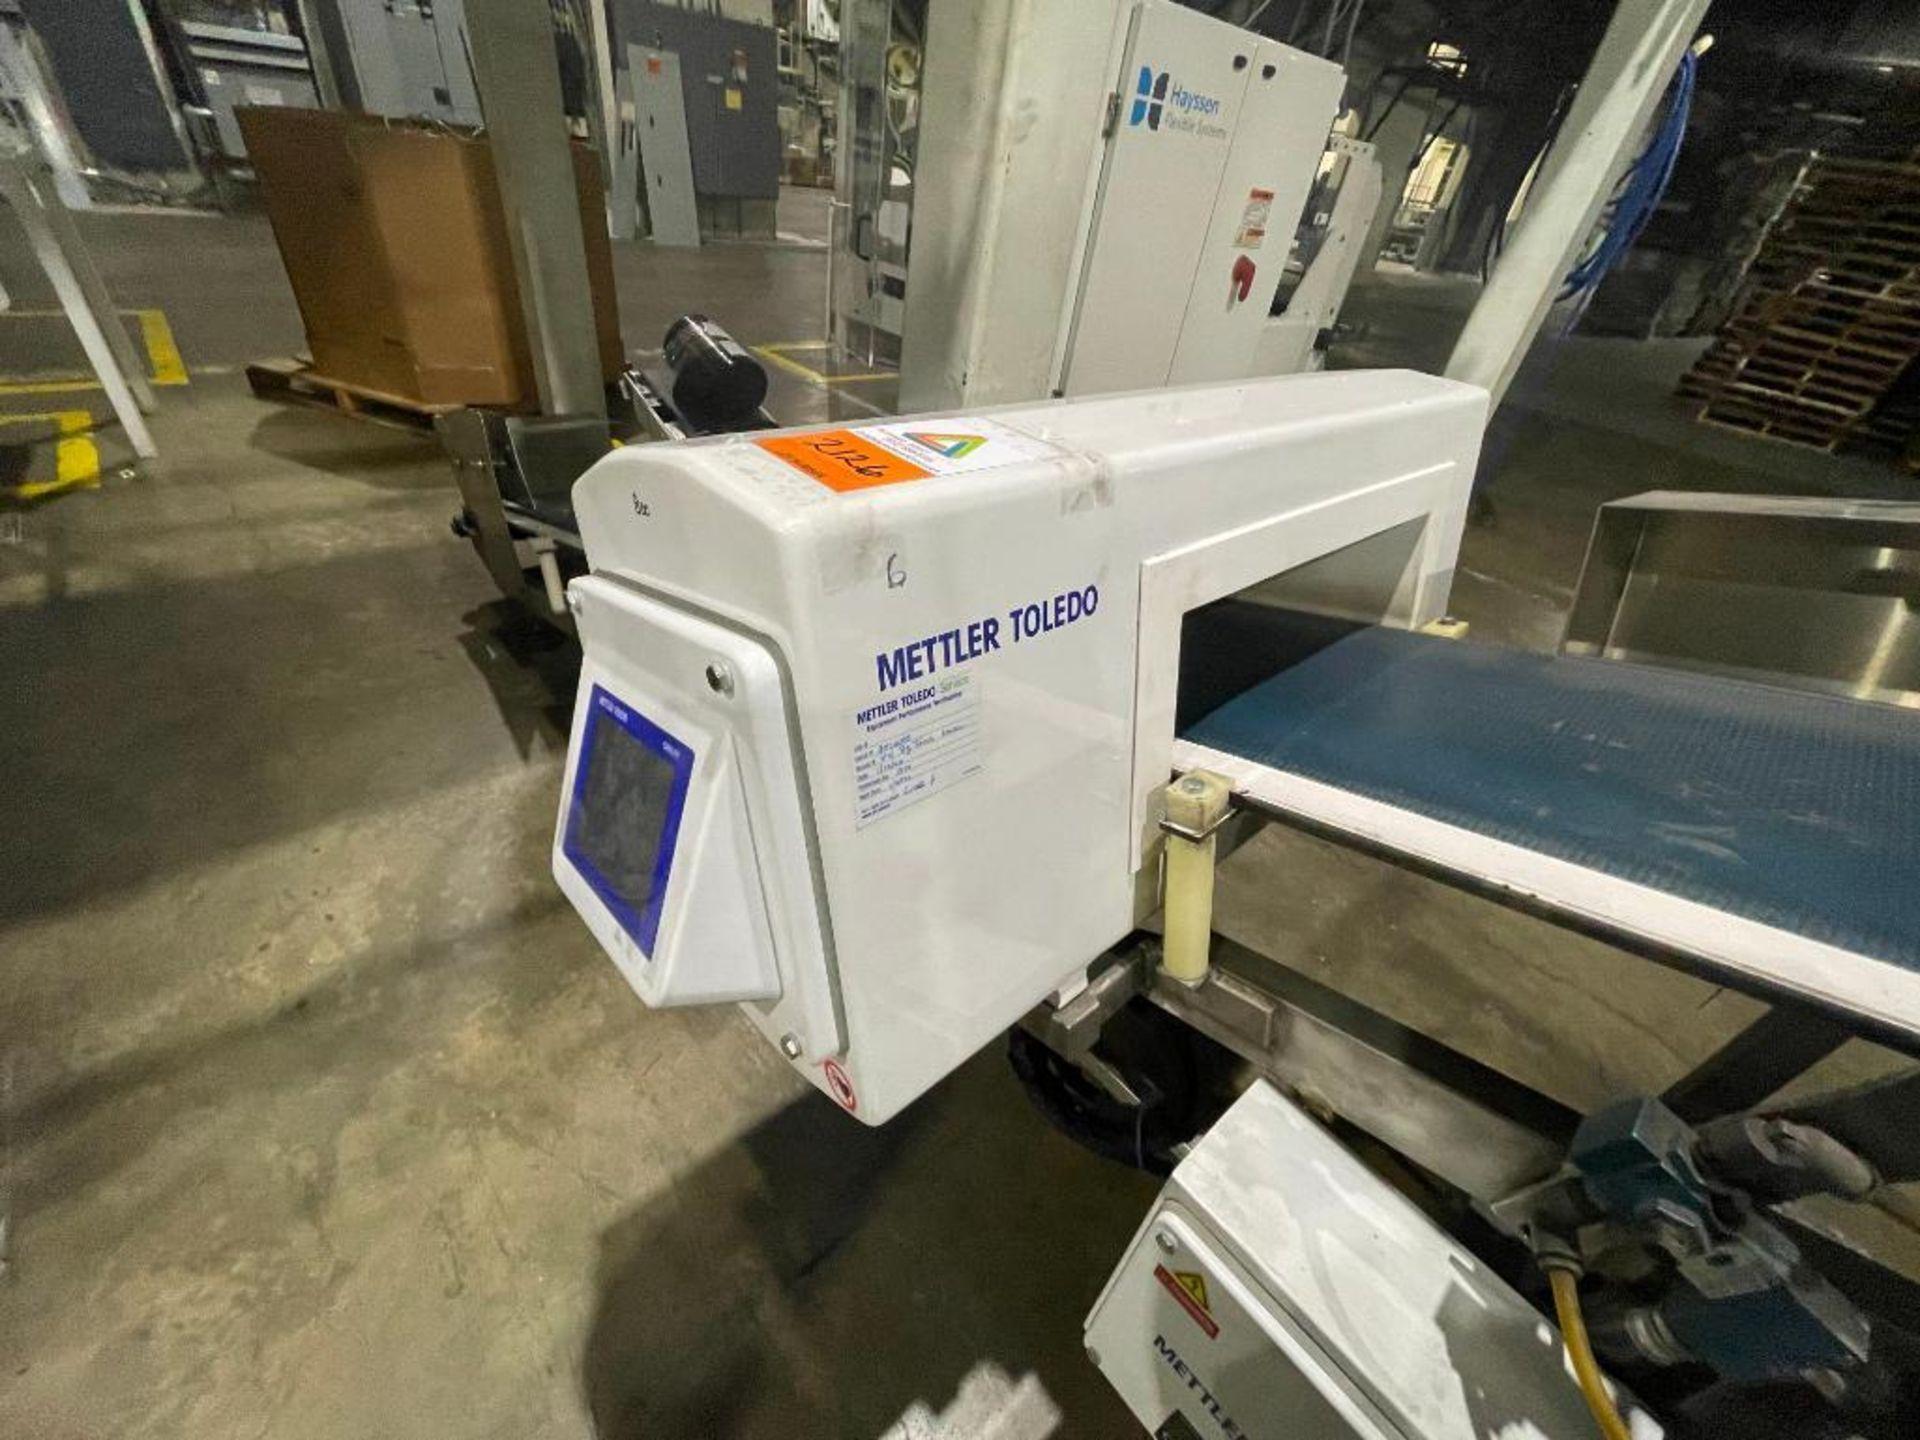 Mettler Toledo metal detector, model V4-1 - Image 9 of 14